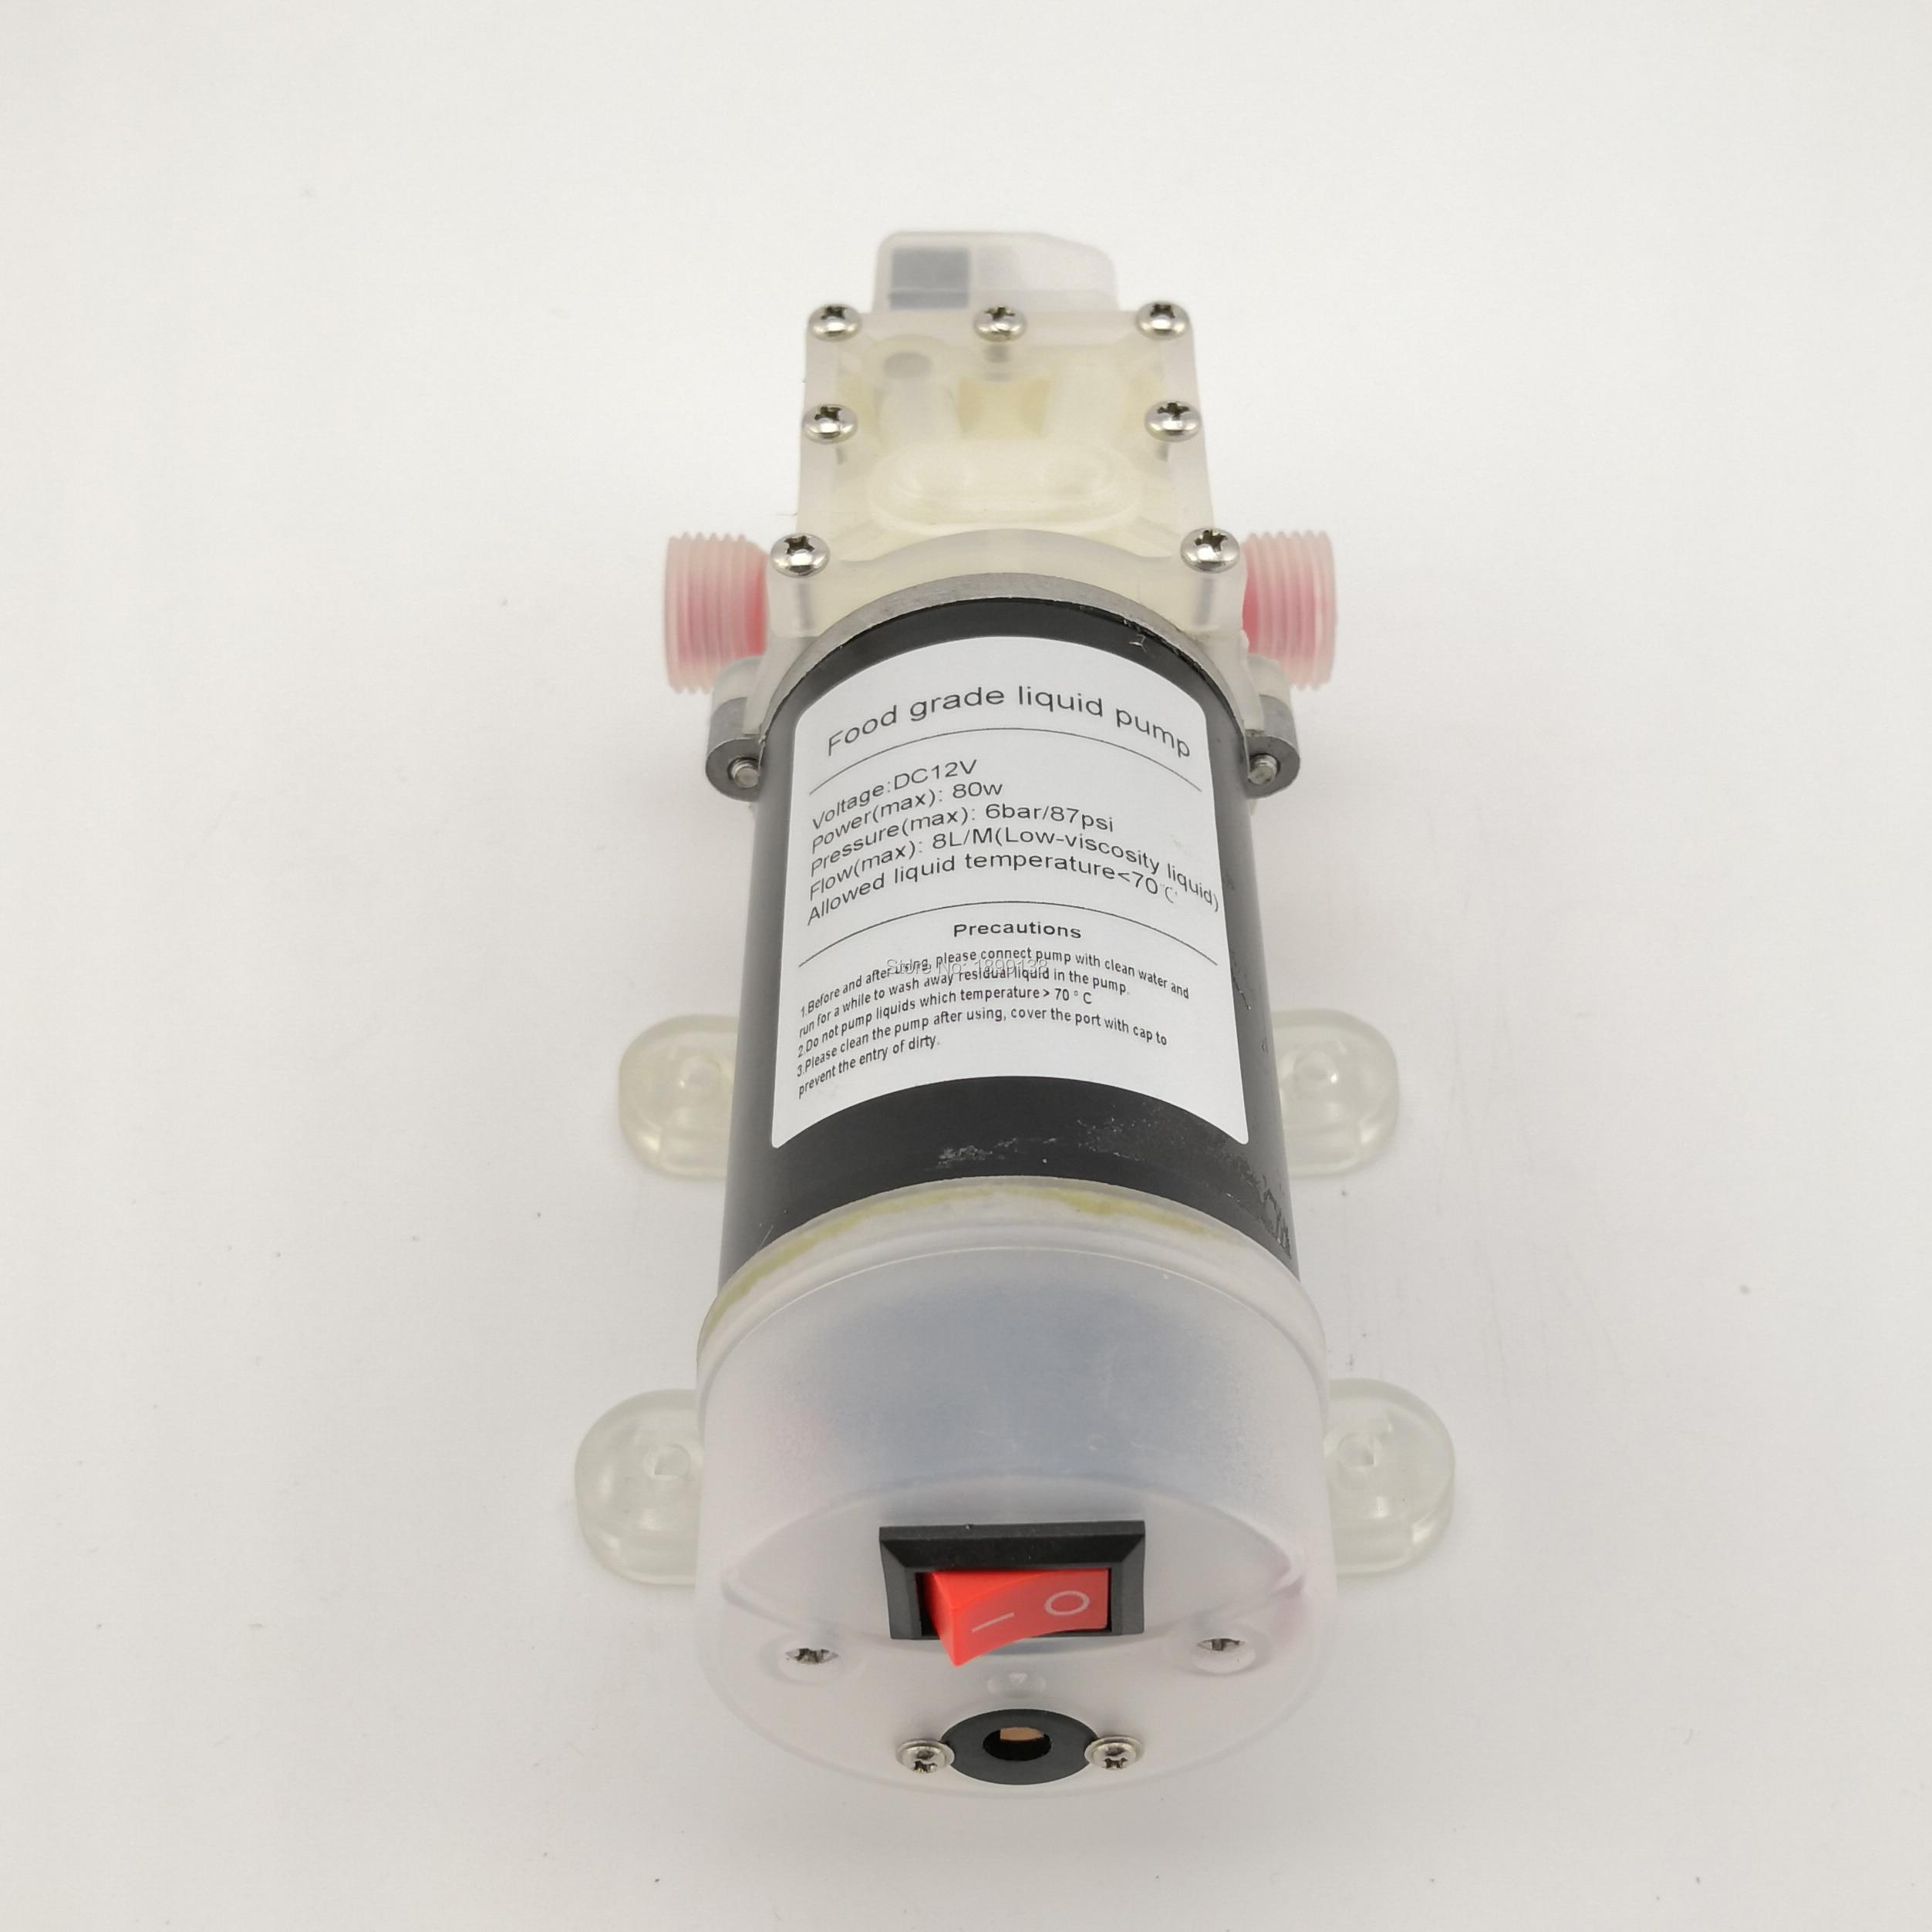 DC 12v 80w 8L/M self priming pump automatic pressure control food grade transfer pump for wine milk G1/2 расходомер barry 4 g1 2 2 8l min